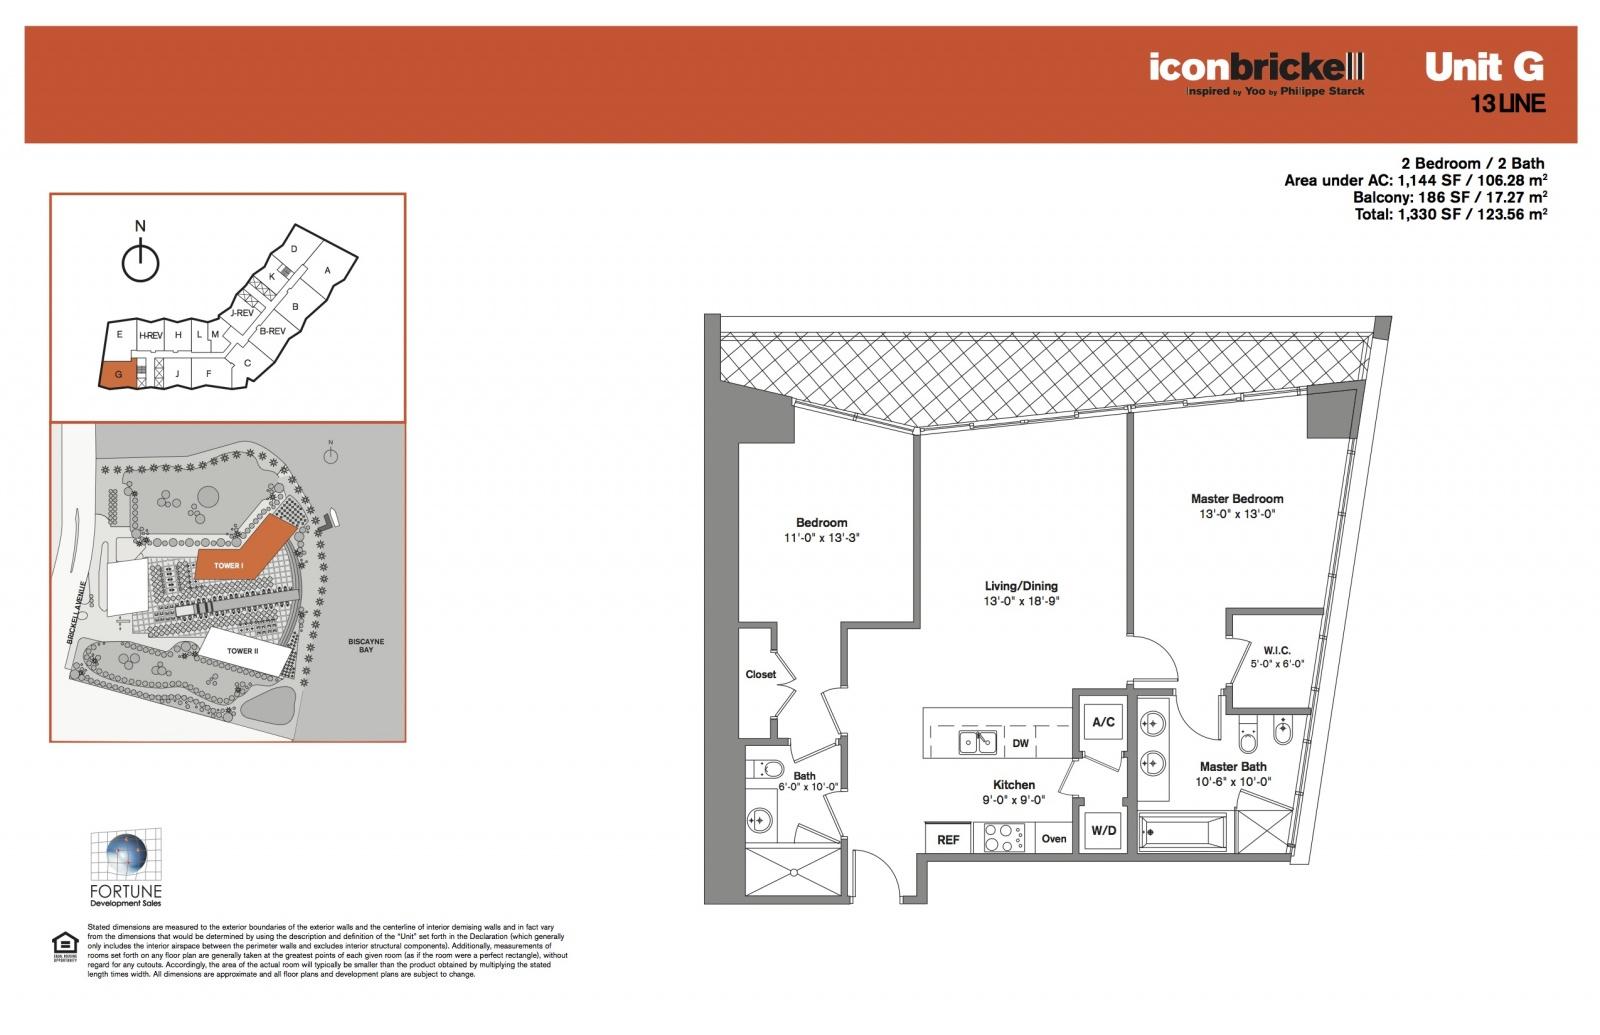 Icon Brickell One, line 13 floor plans